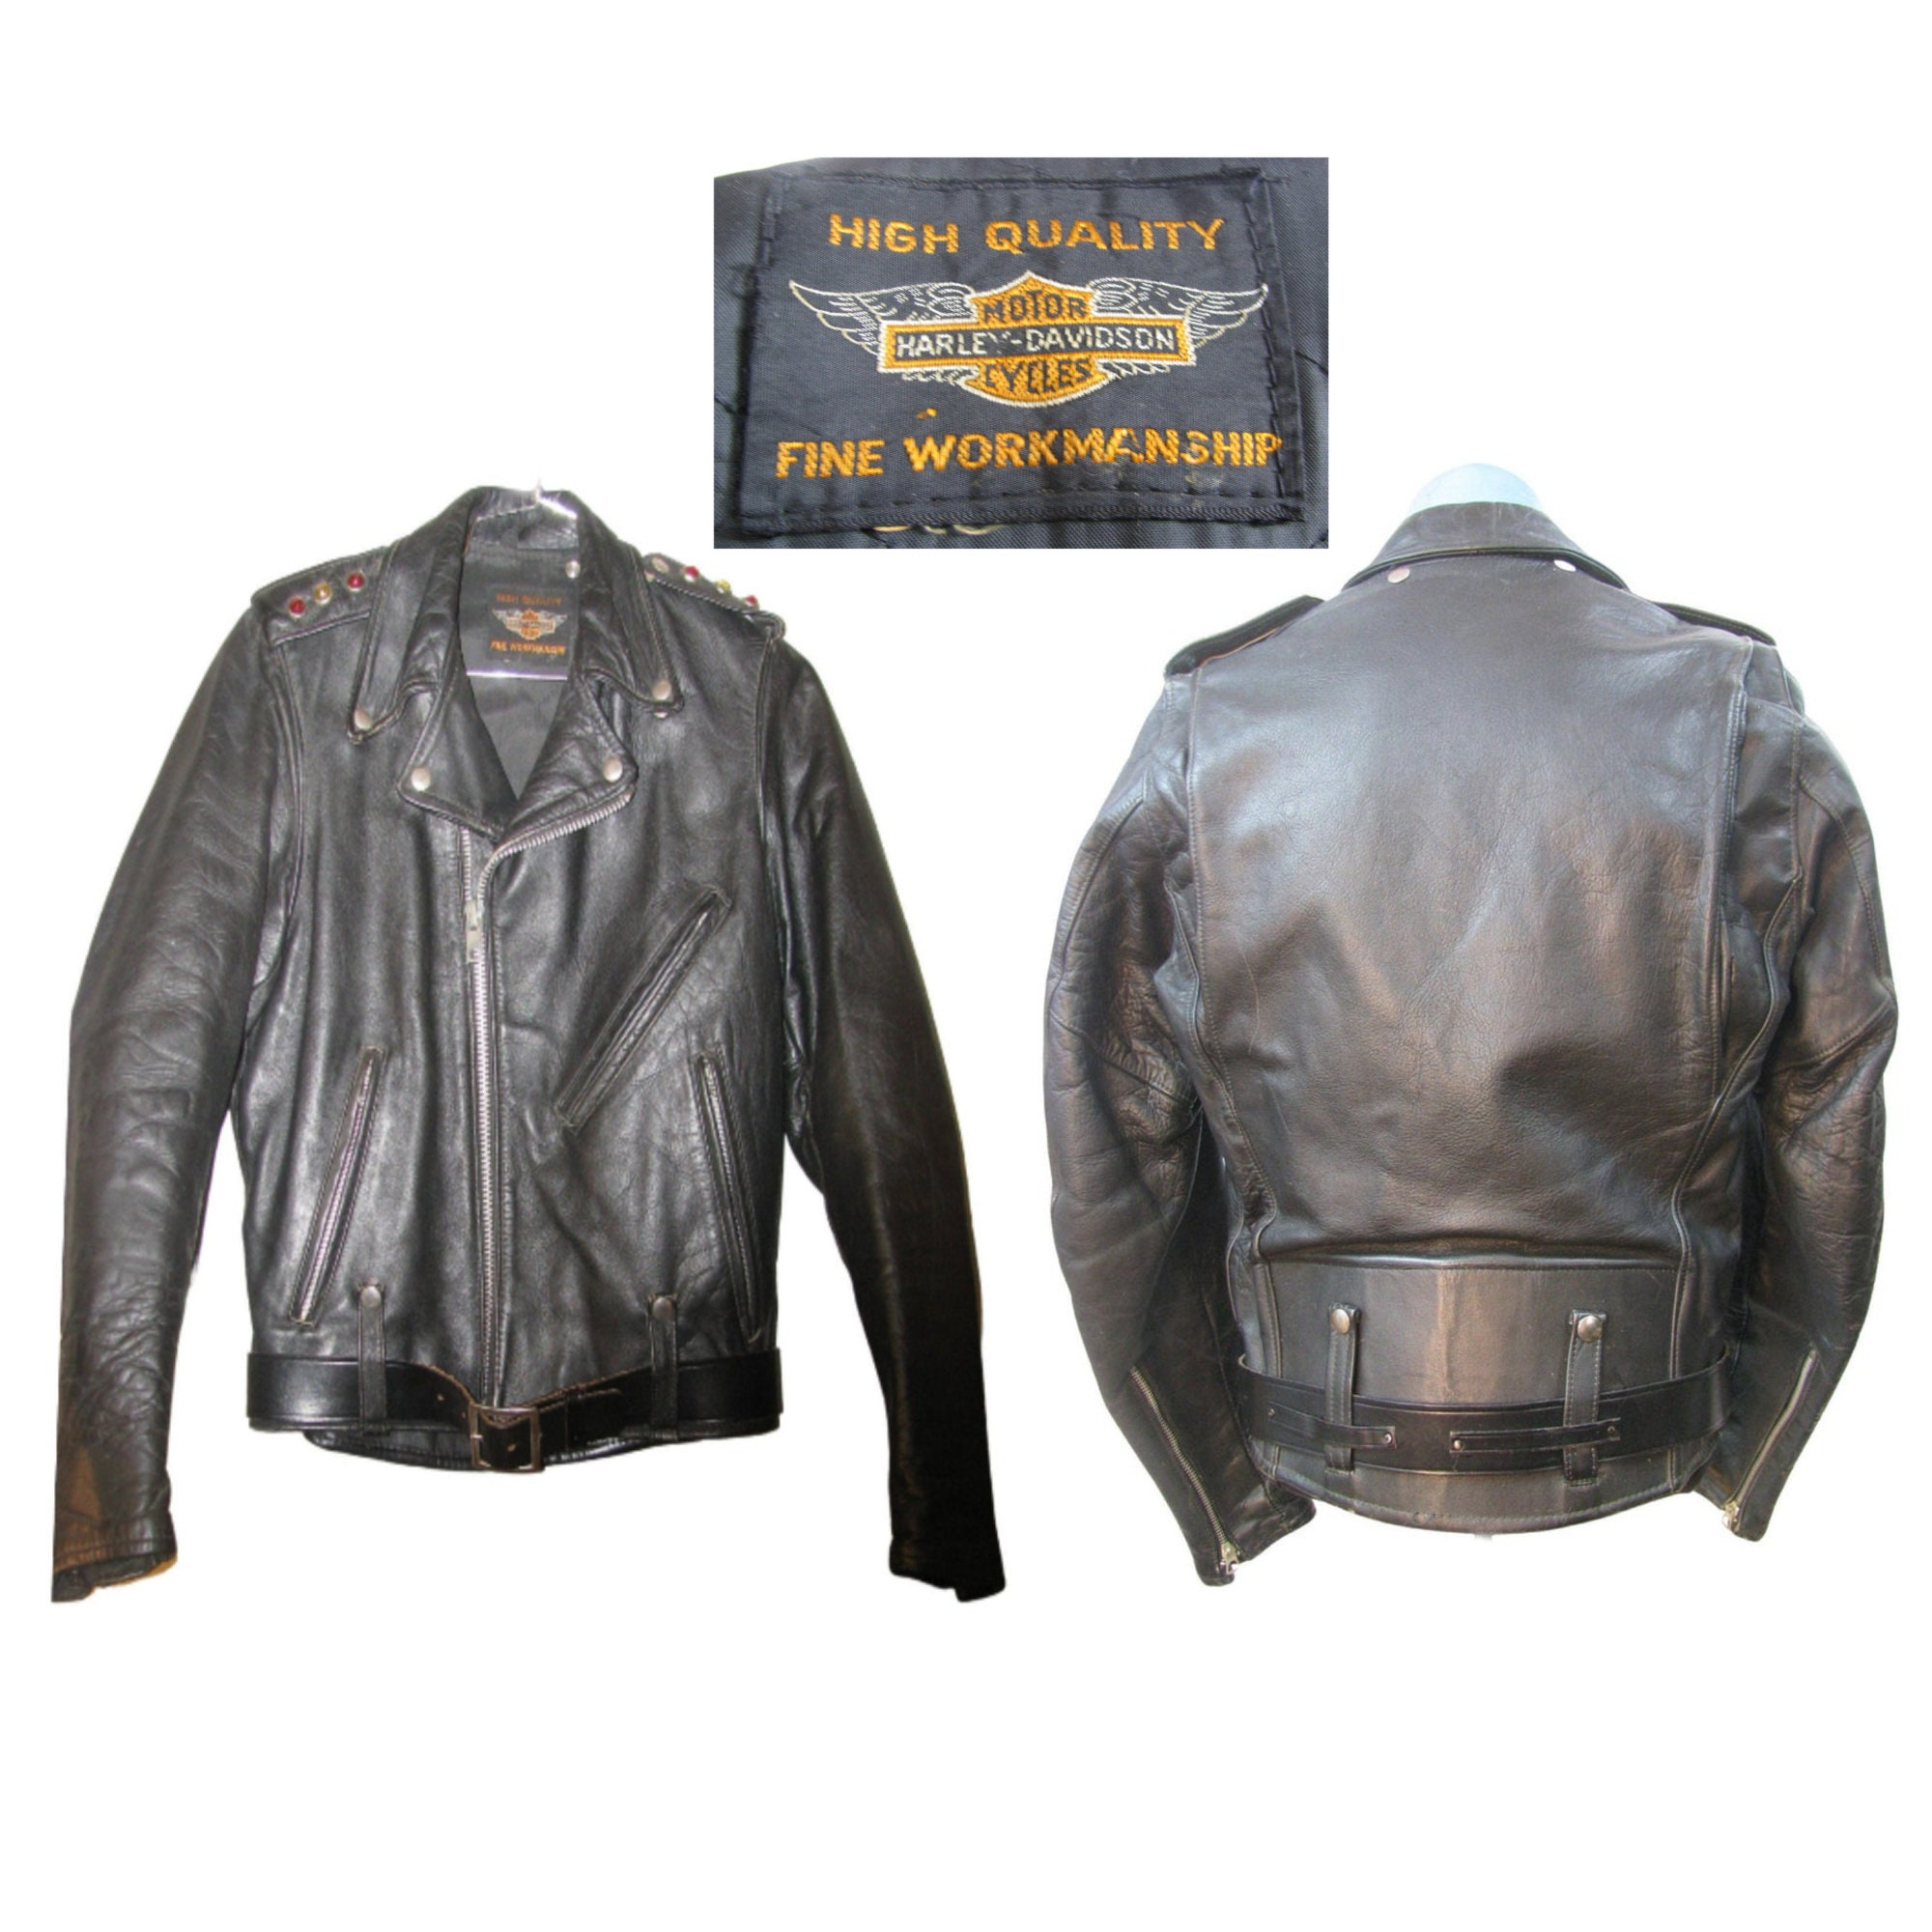 1950s Mens Hats | 50s Vintage Men's Hats Rare 1950S Harley-Davidson Horsehide Motorcycle Jacket With High Quality Fine Workmanship Black Label Has Jewel Studded Epaulets Size Small $675.00 AT vintagedancer.com